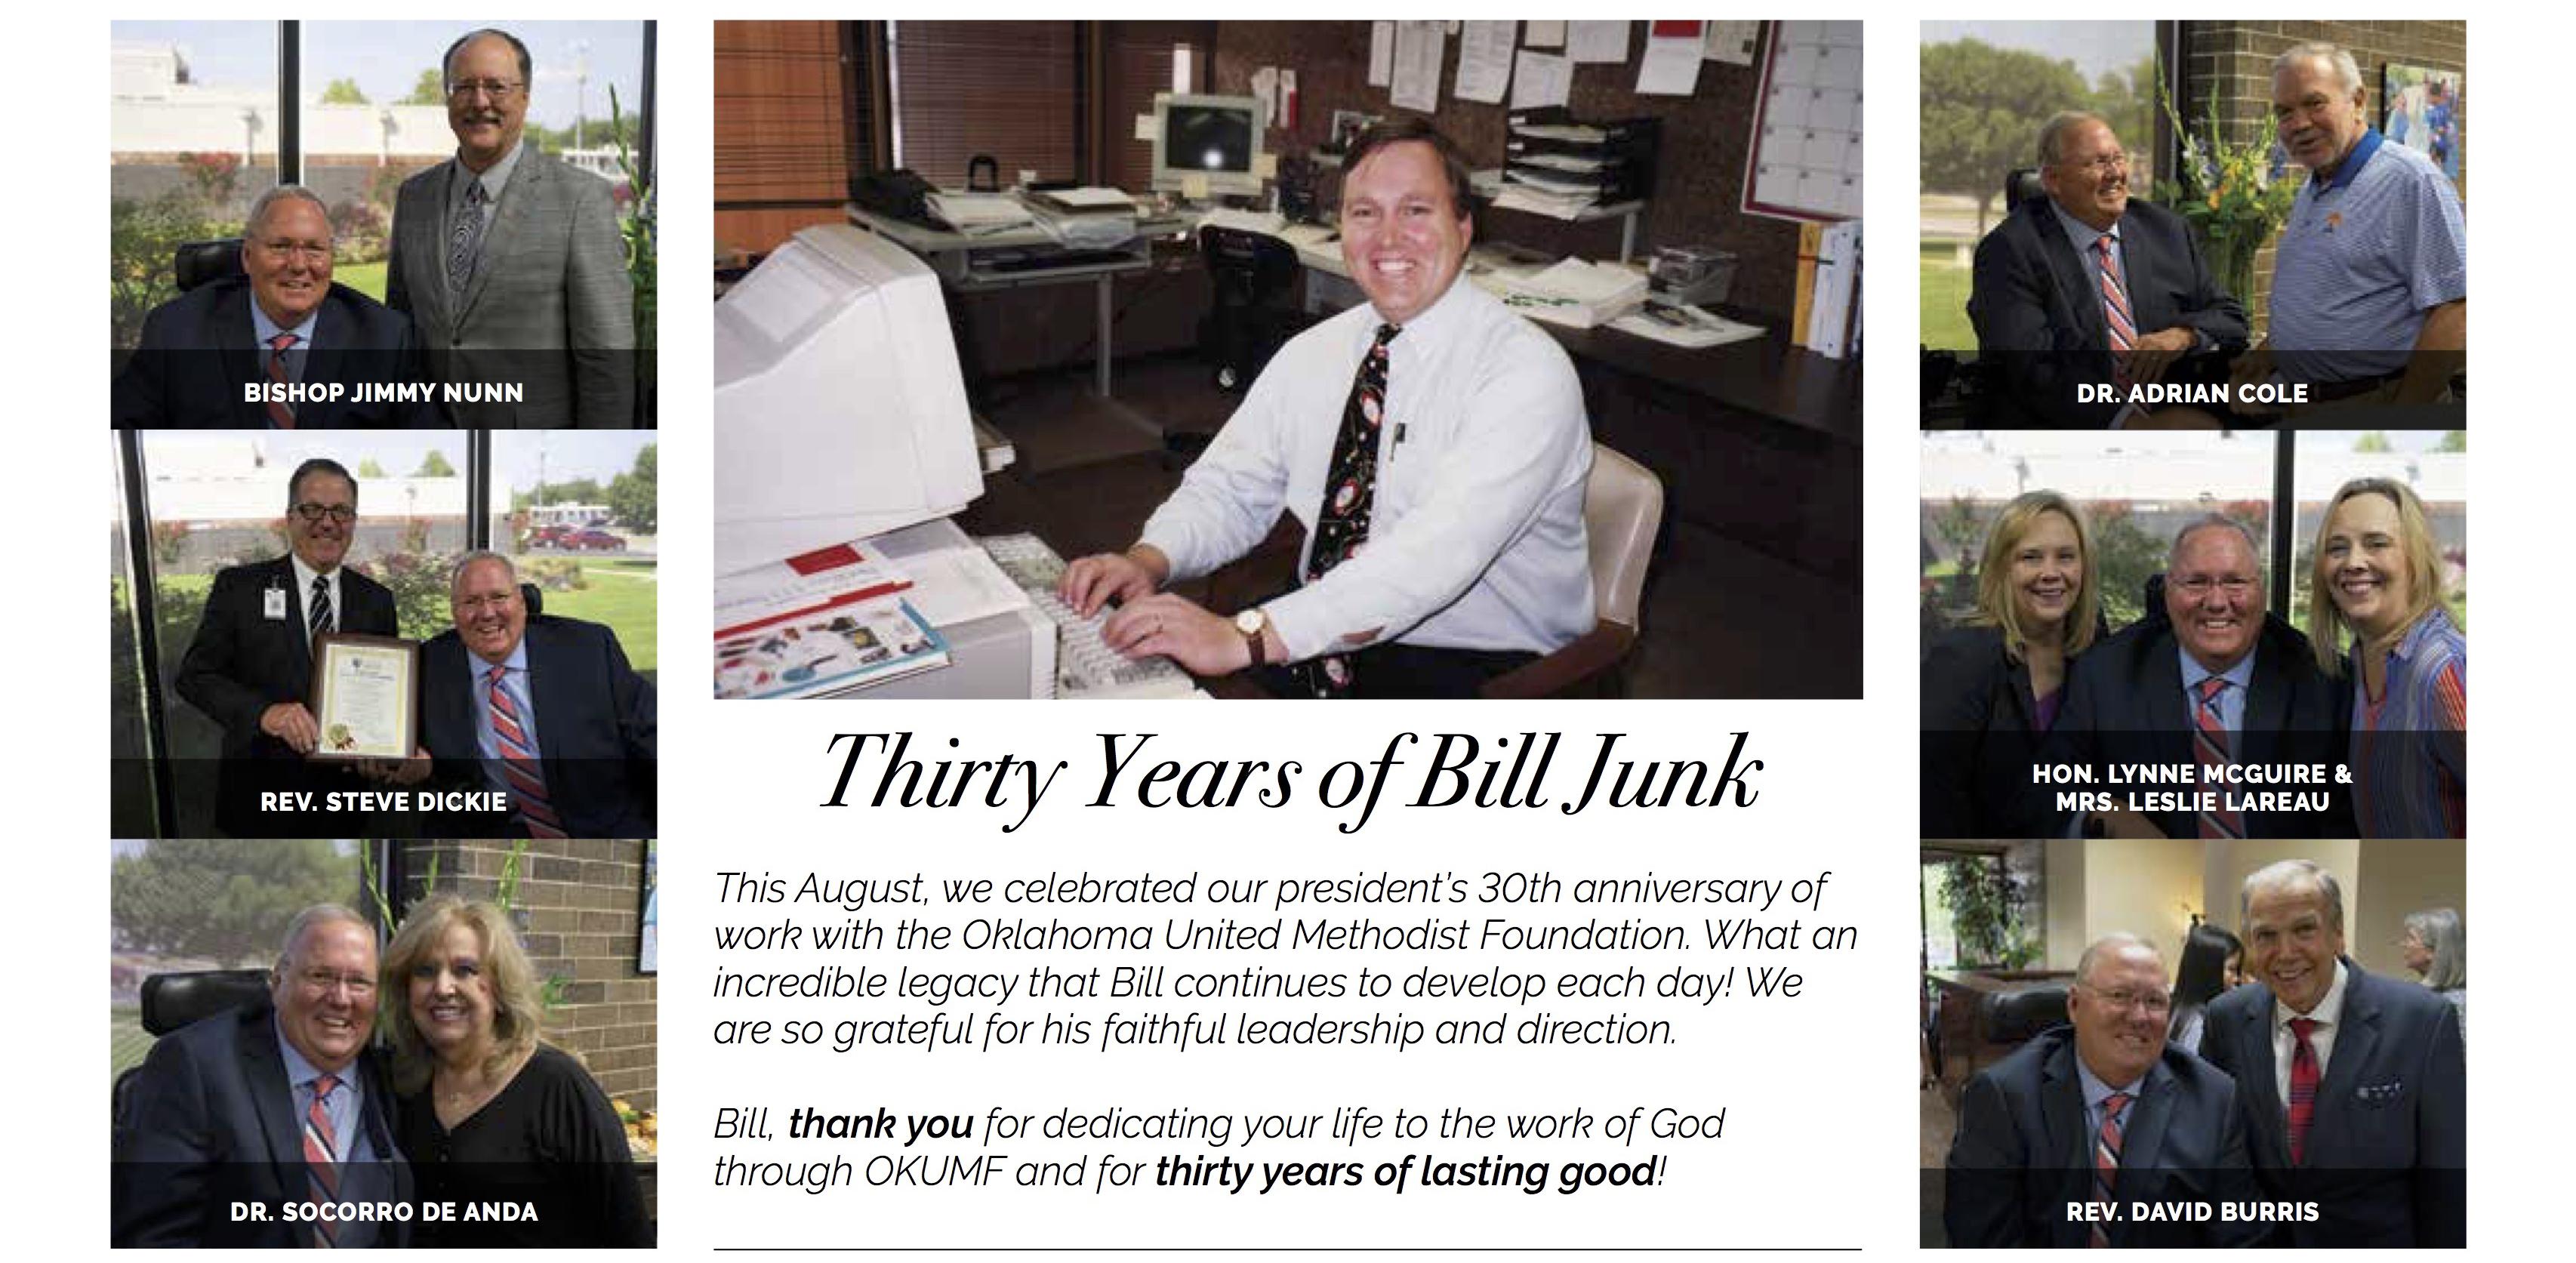 Bill Junk 30 Years